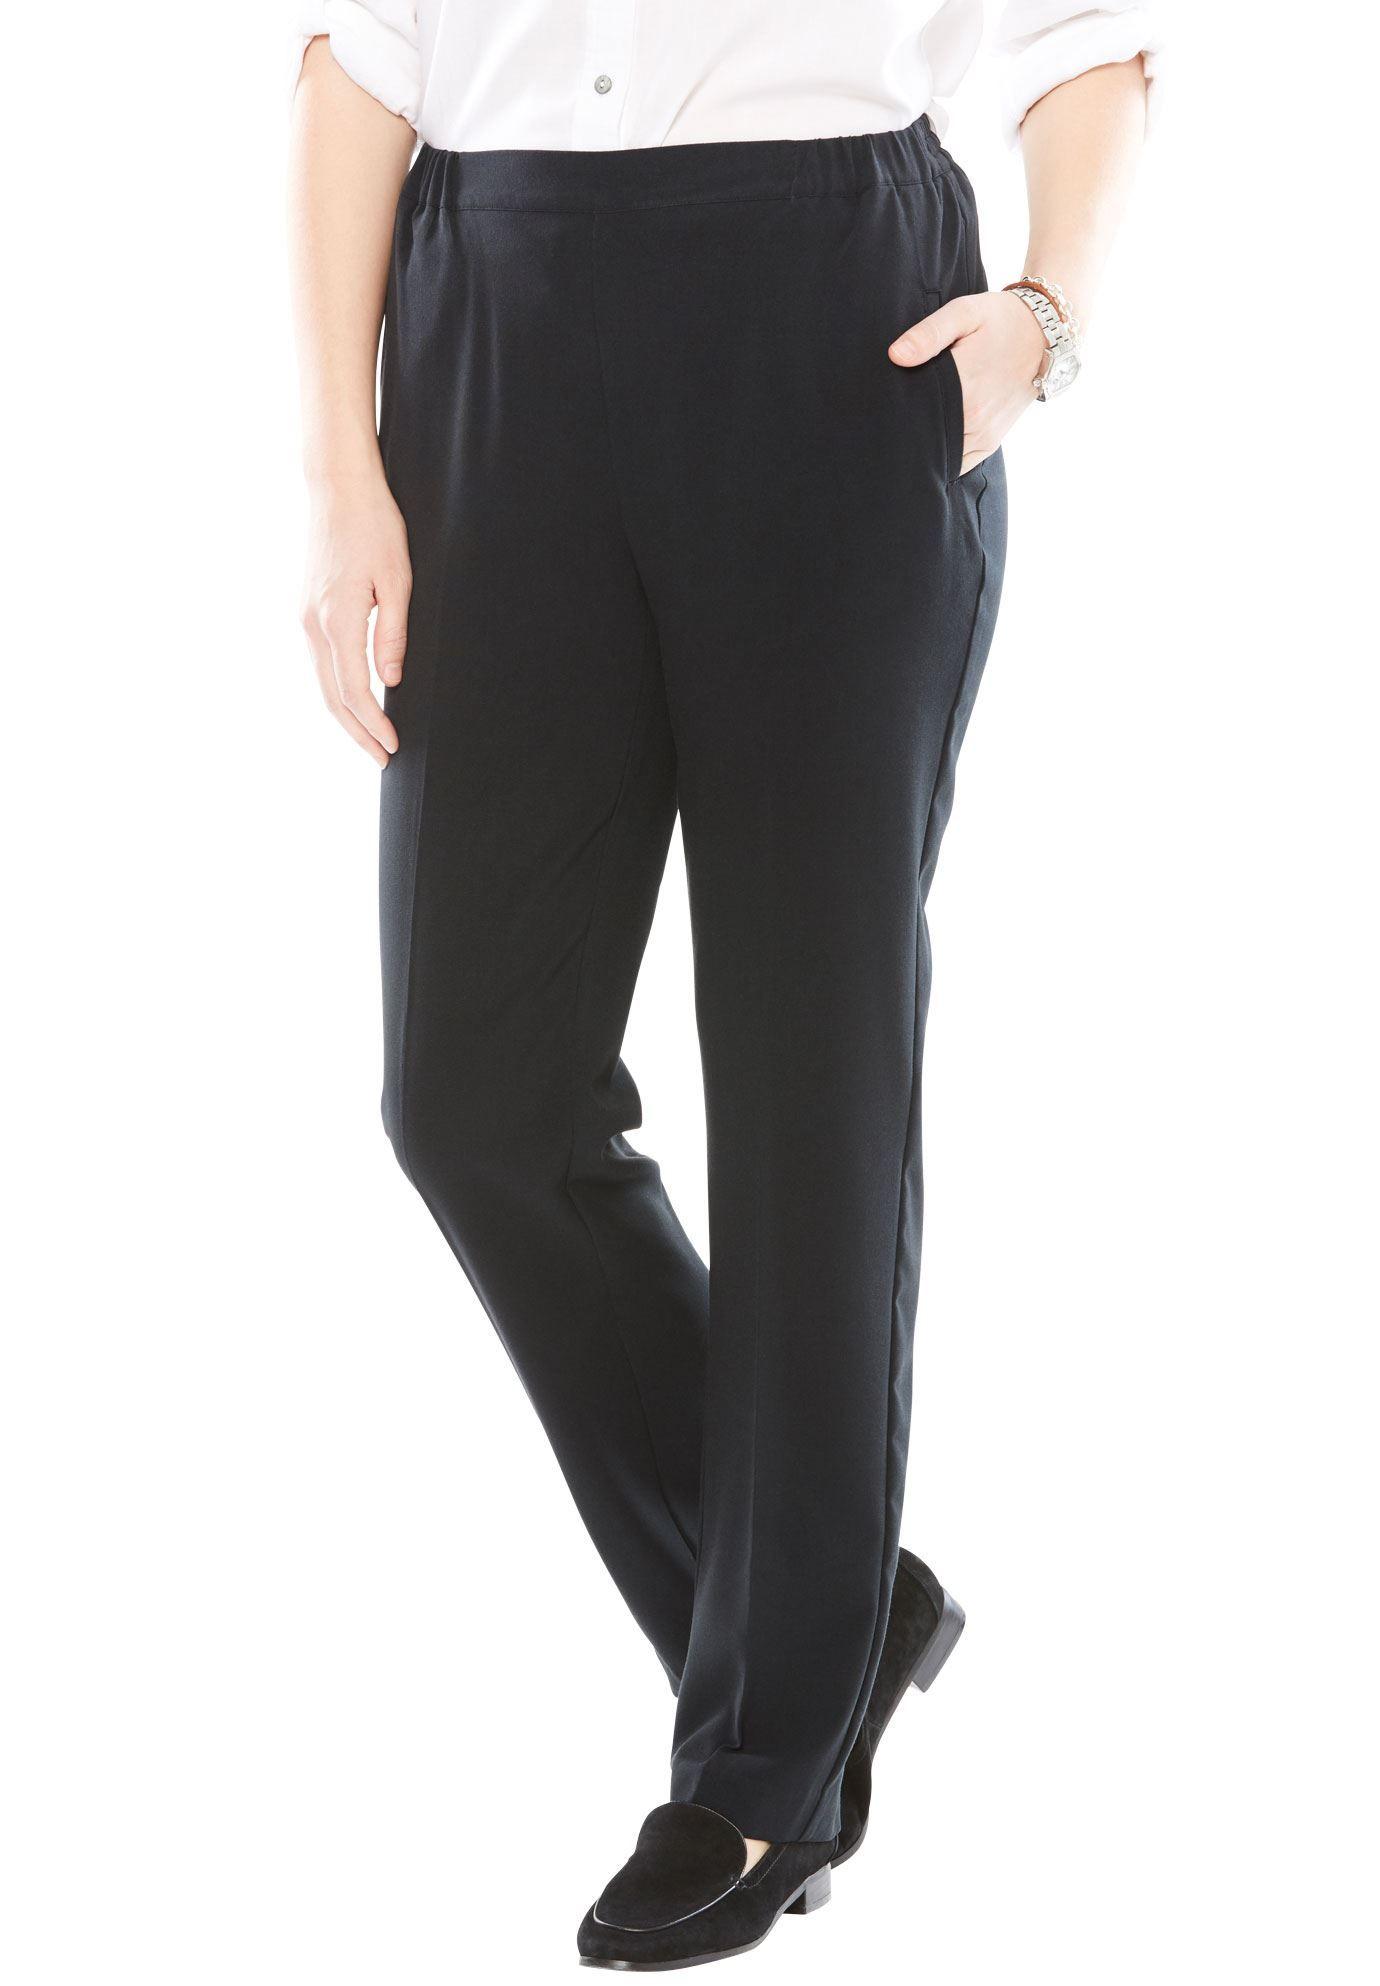 Petite trouser jean sister xxx shool